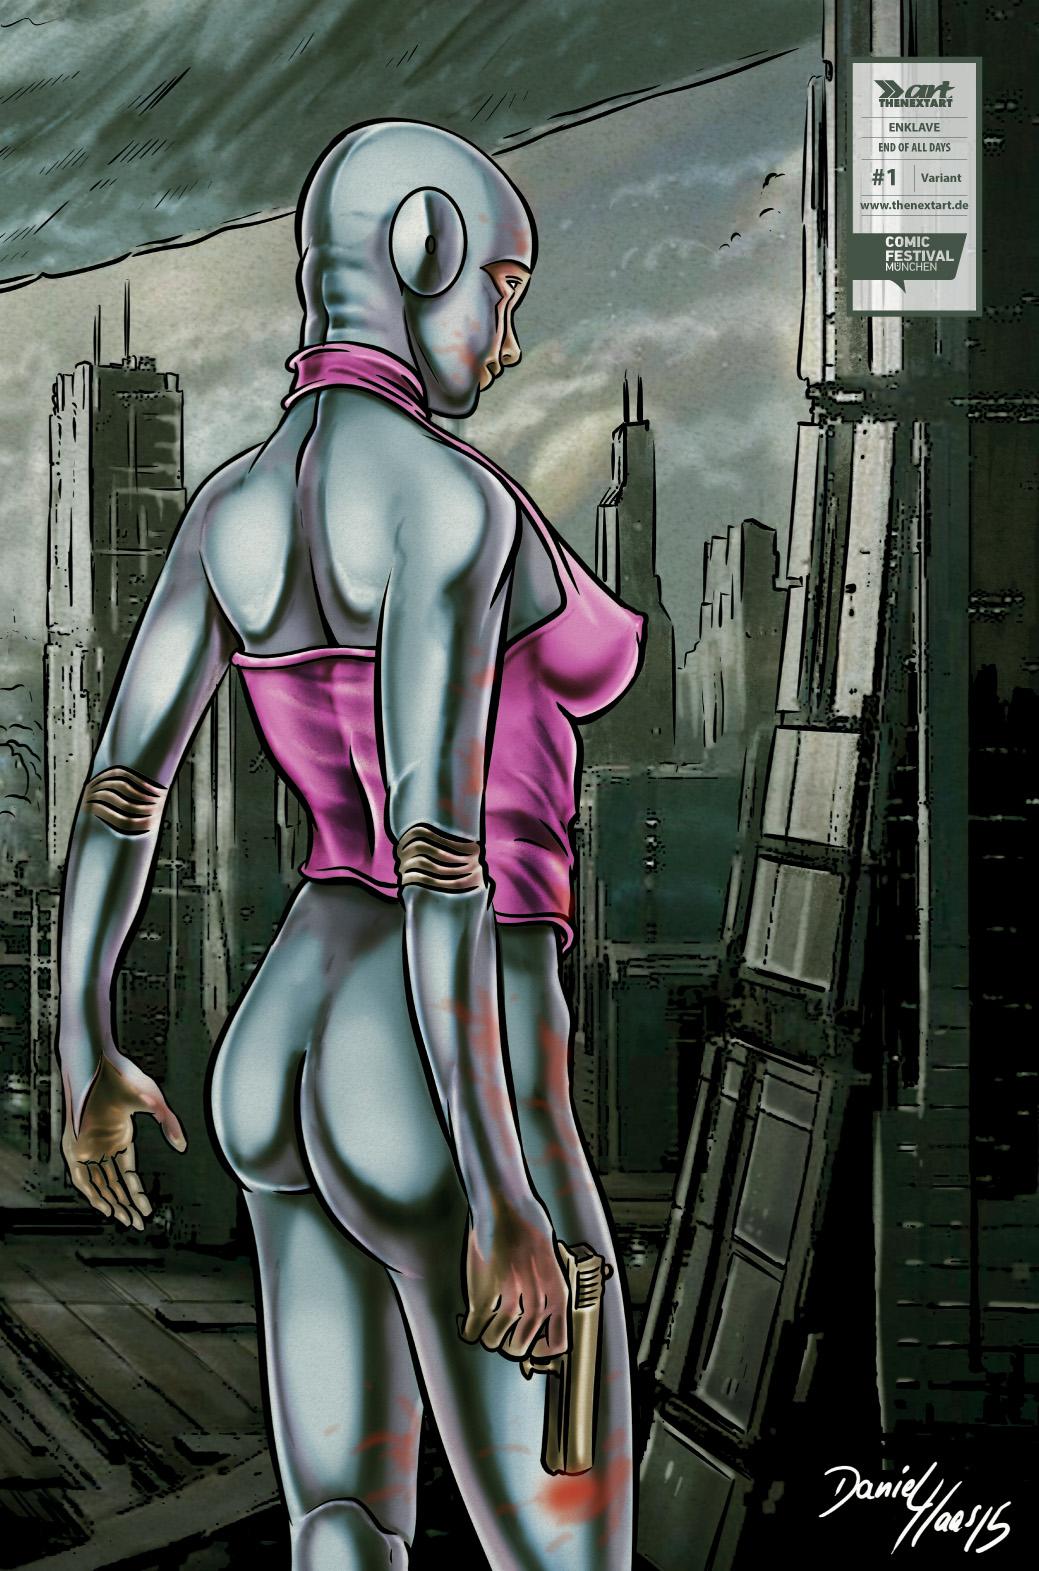 Sascha Dörp Comic Cabin Enklave – End of all Days 1 Variant Cover Daniel Haas